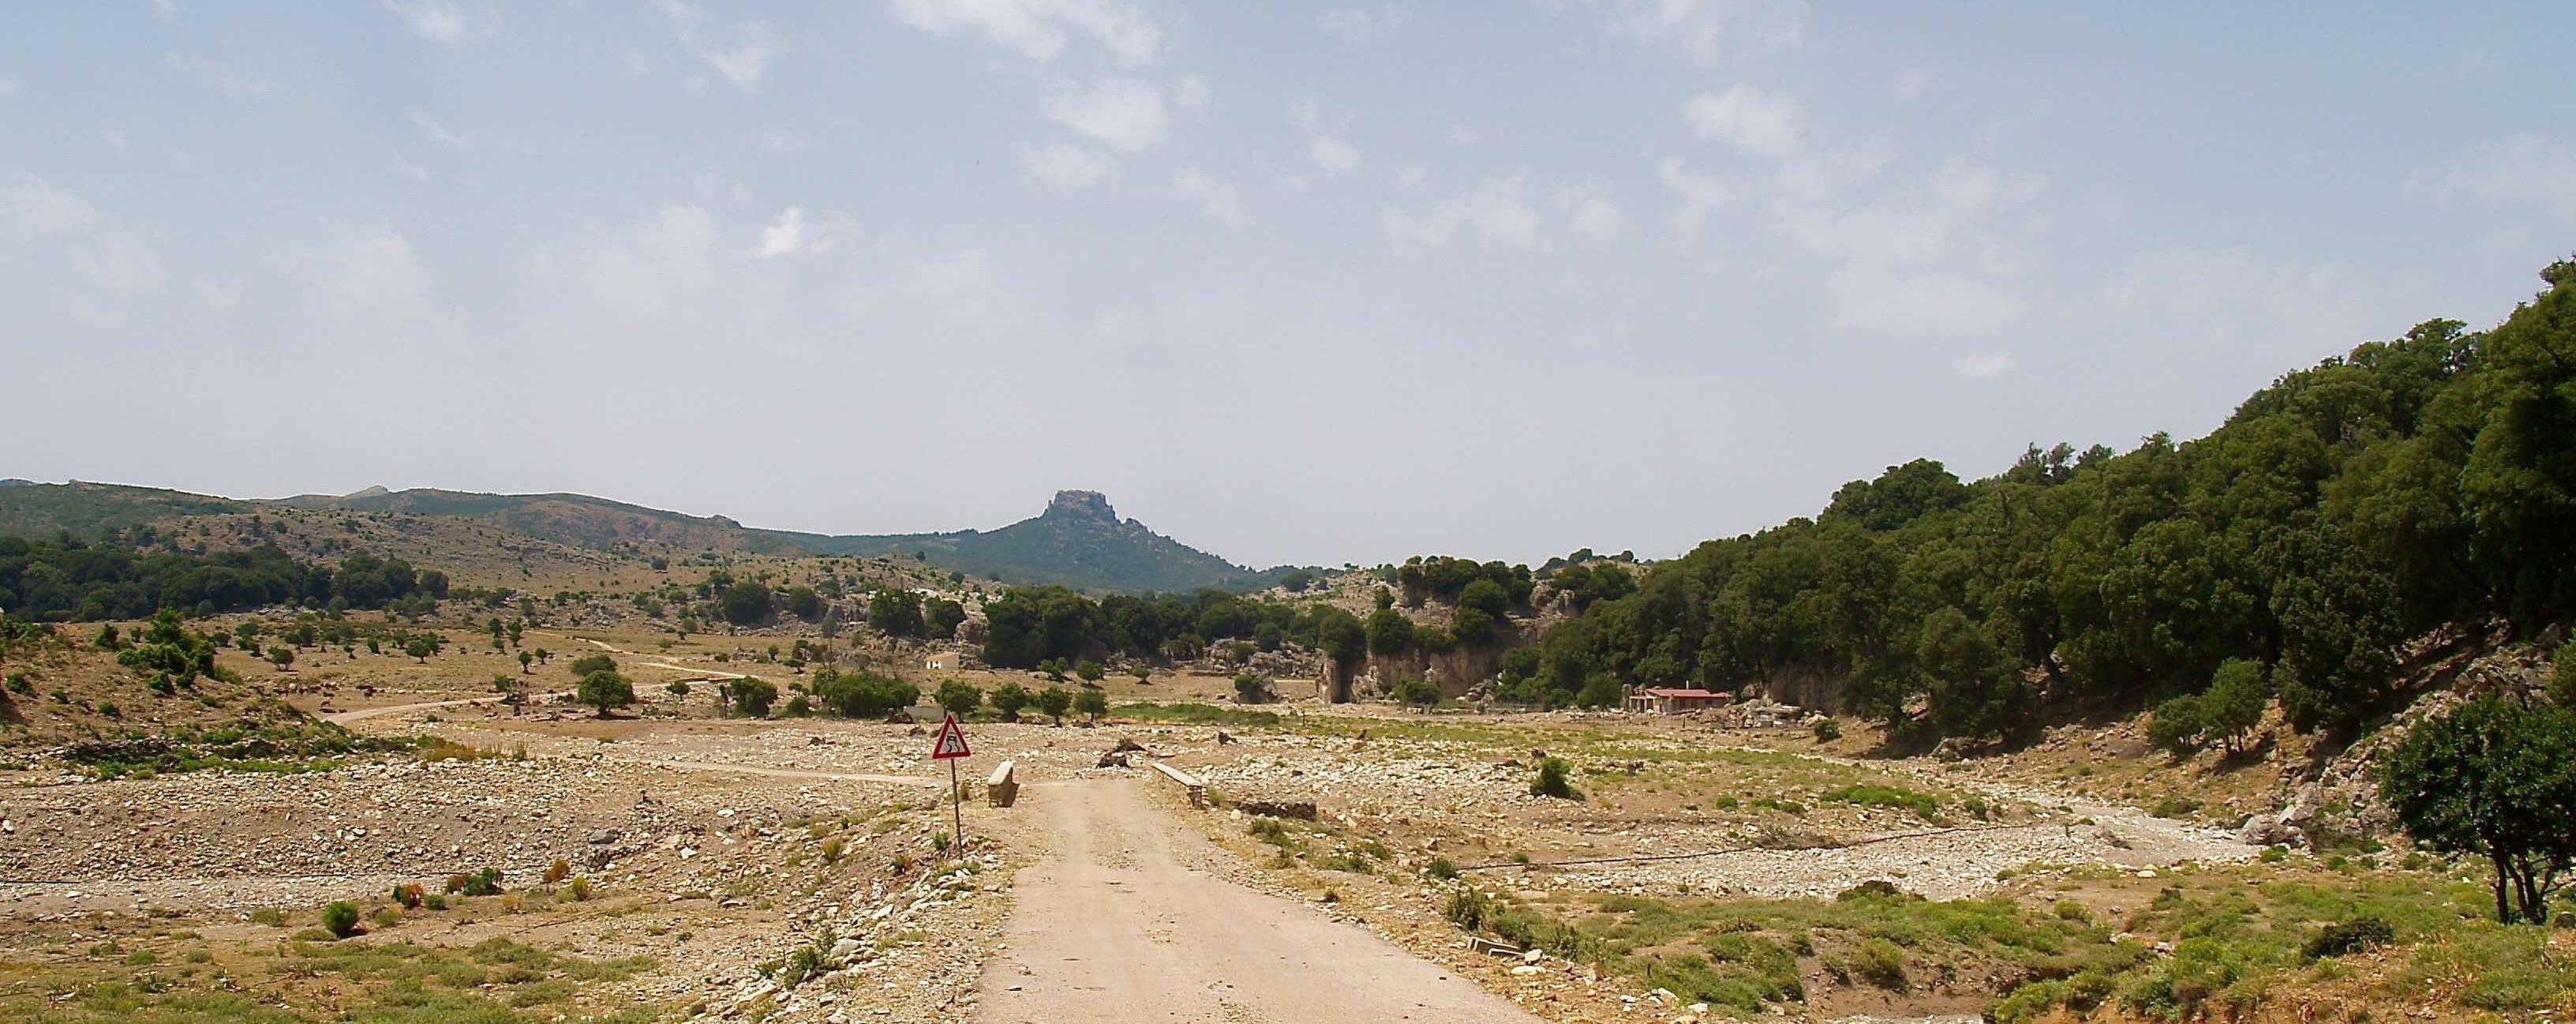 Fennau, vista del Monte Novo San Giovanni.